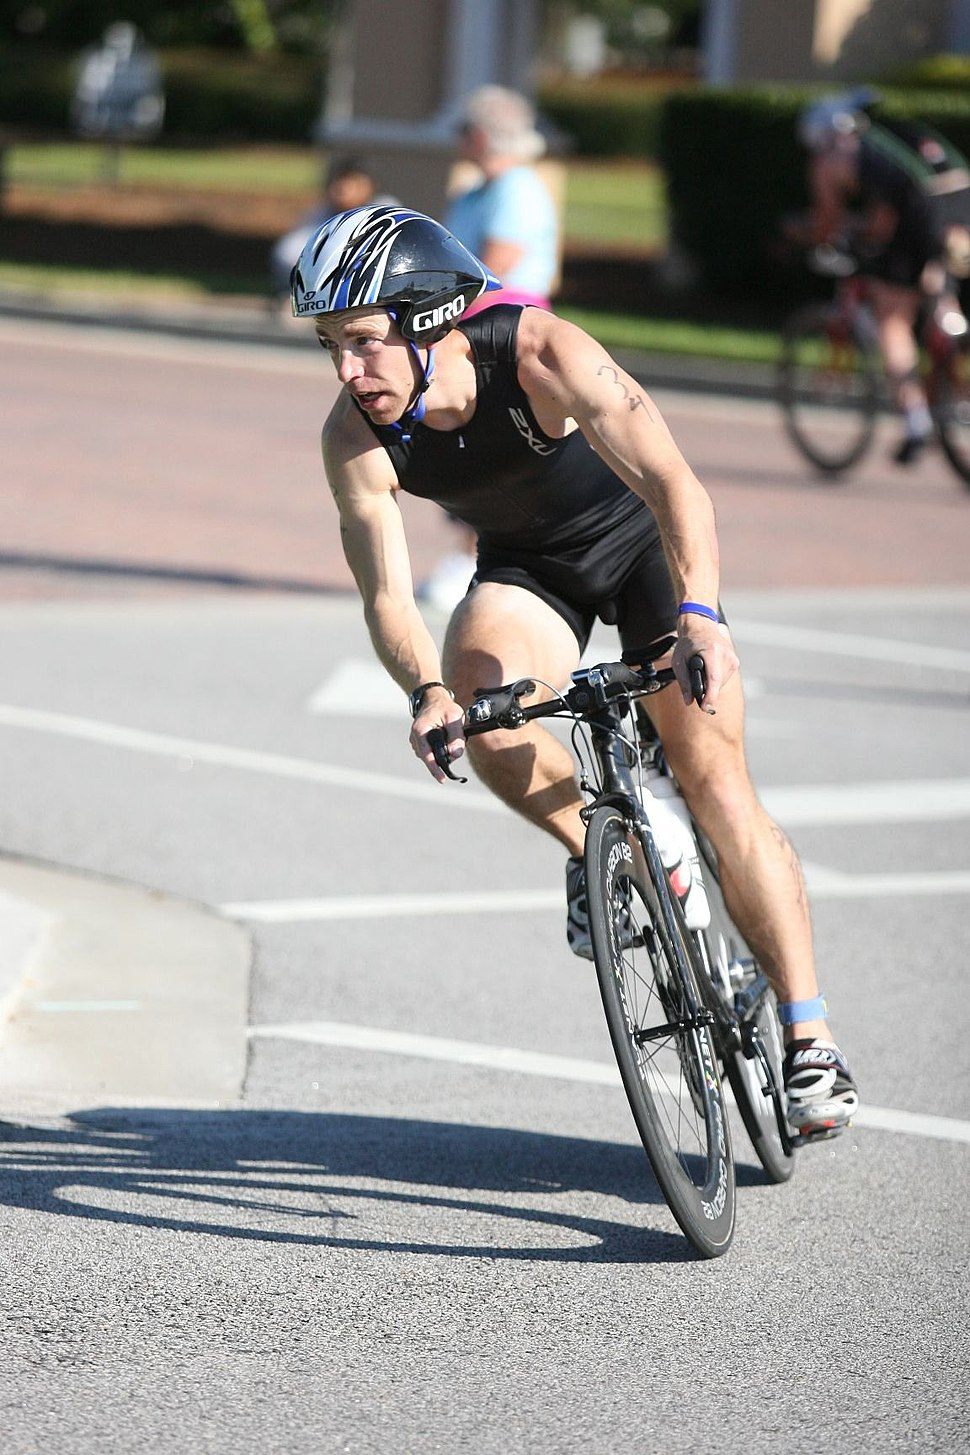 Triathlete on bike